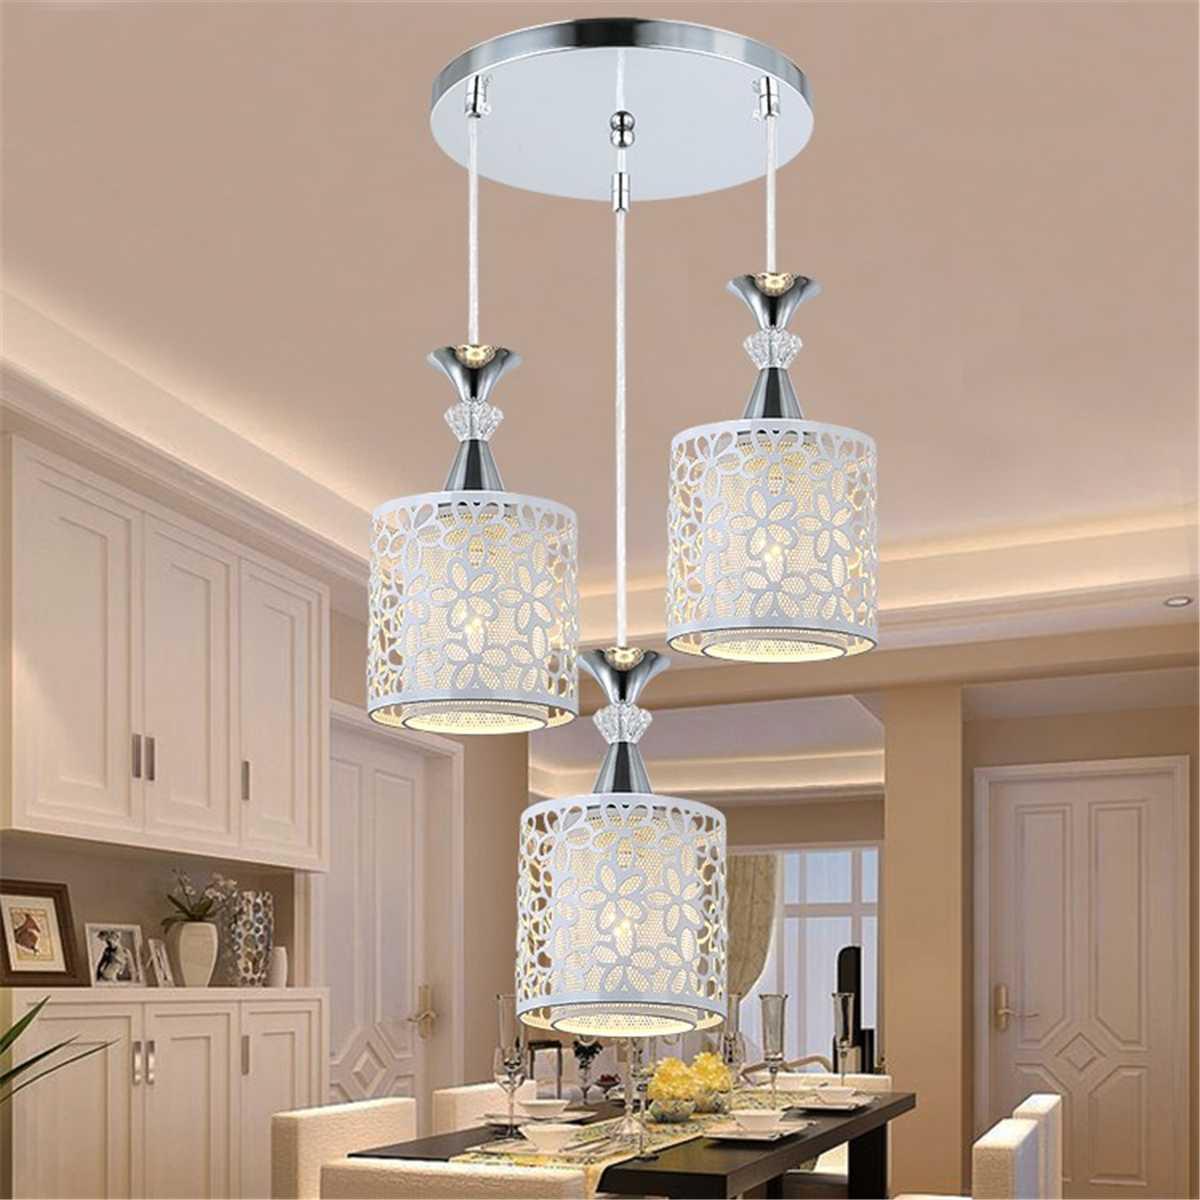 Lámparas LED de techo hechas cristal modernas para sala de estar y comedor